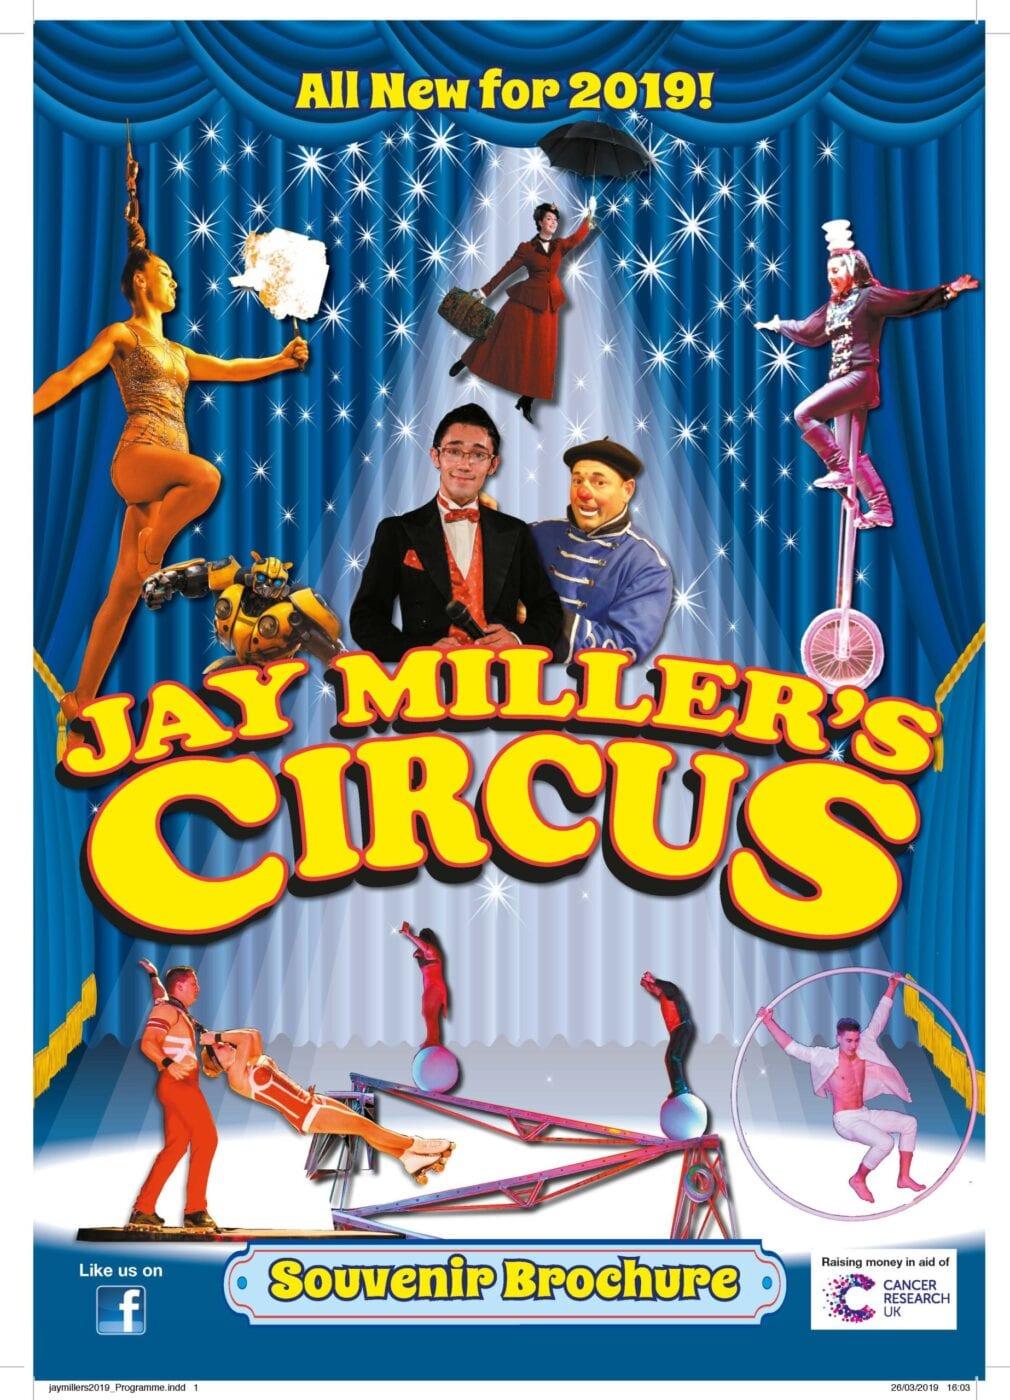 Jay Miller's Circus Brochures 2019